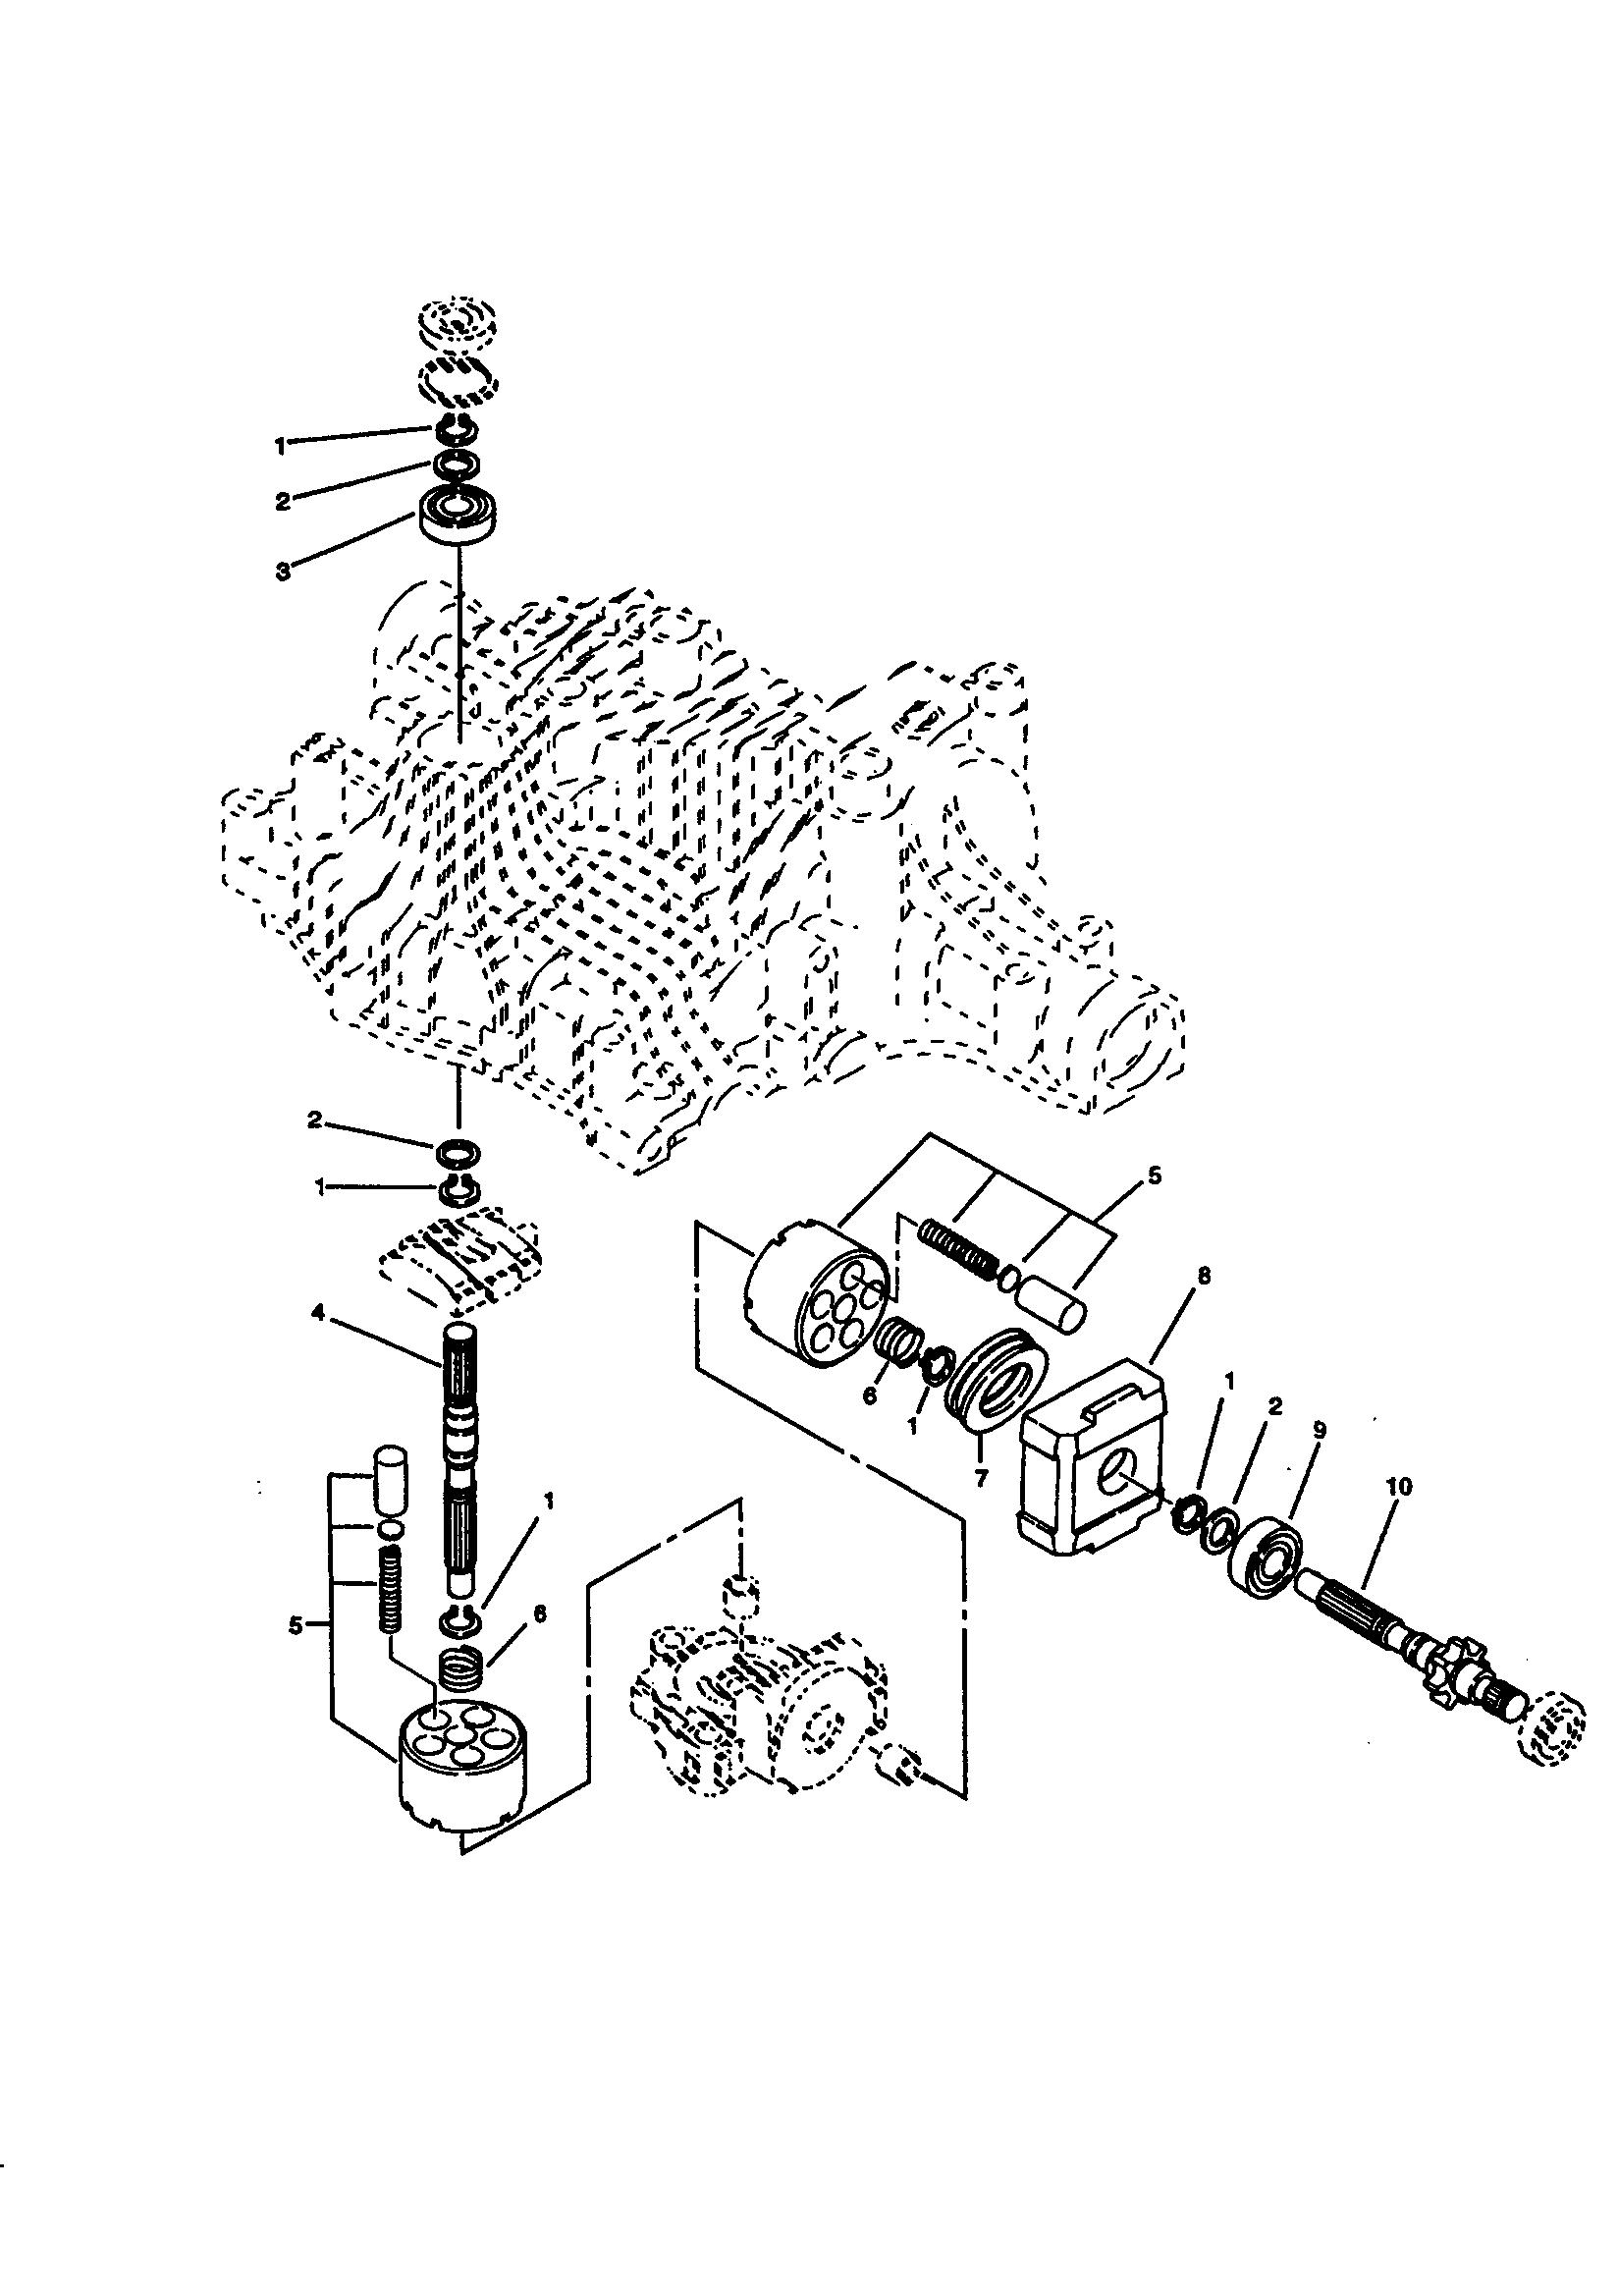 john deere sabre wiring diagram 7 pin round trailer connector riding mower get free image about